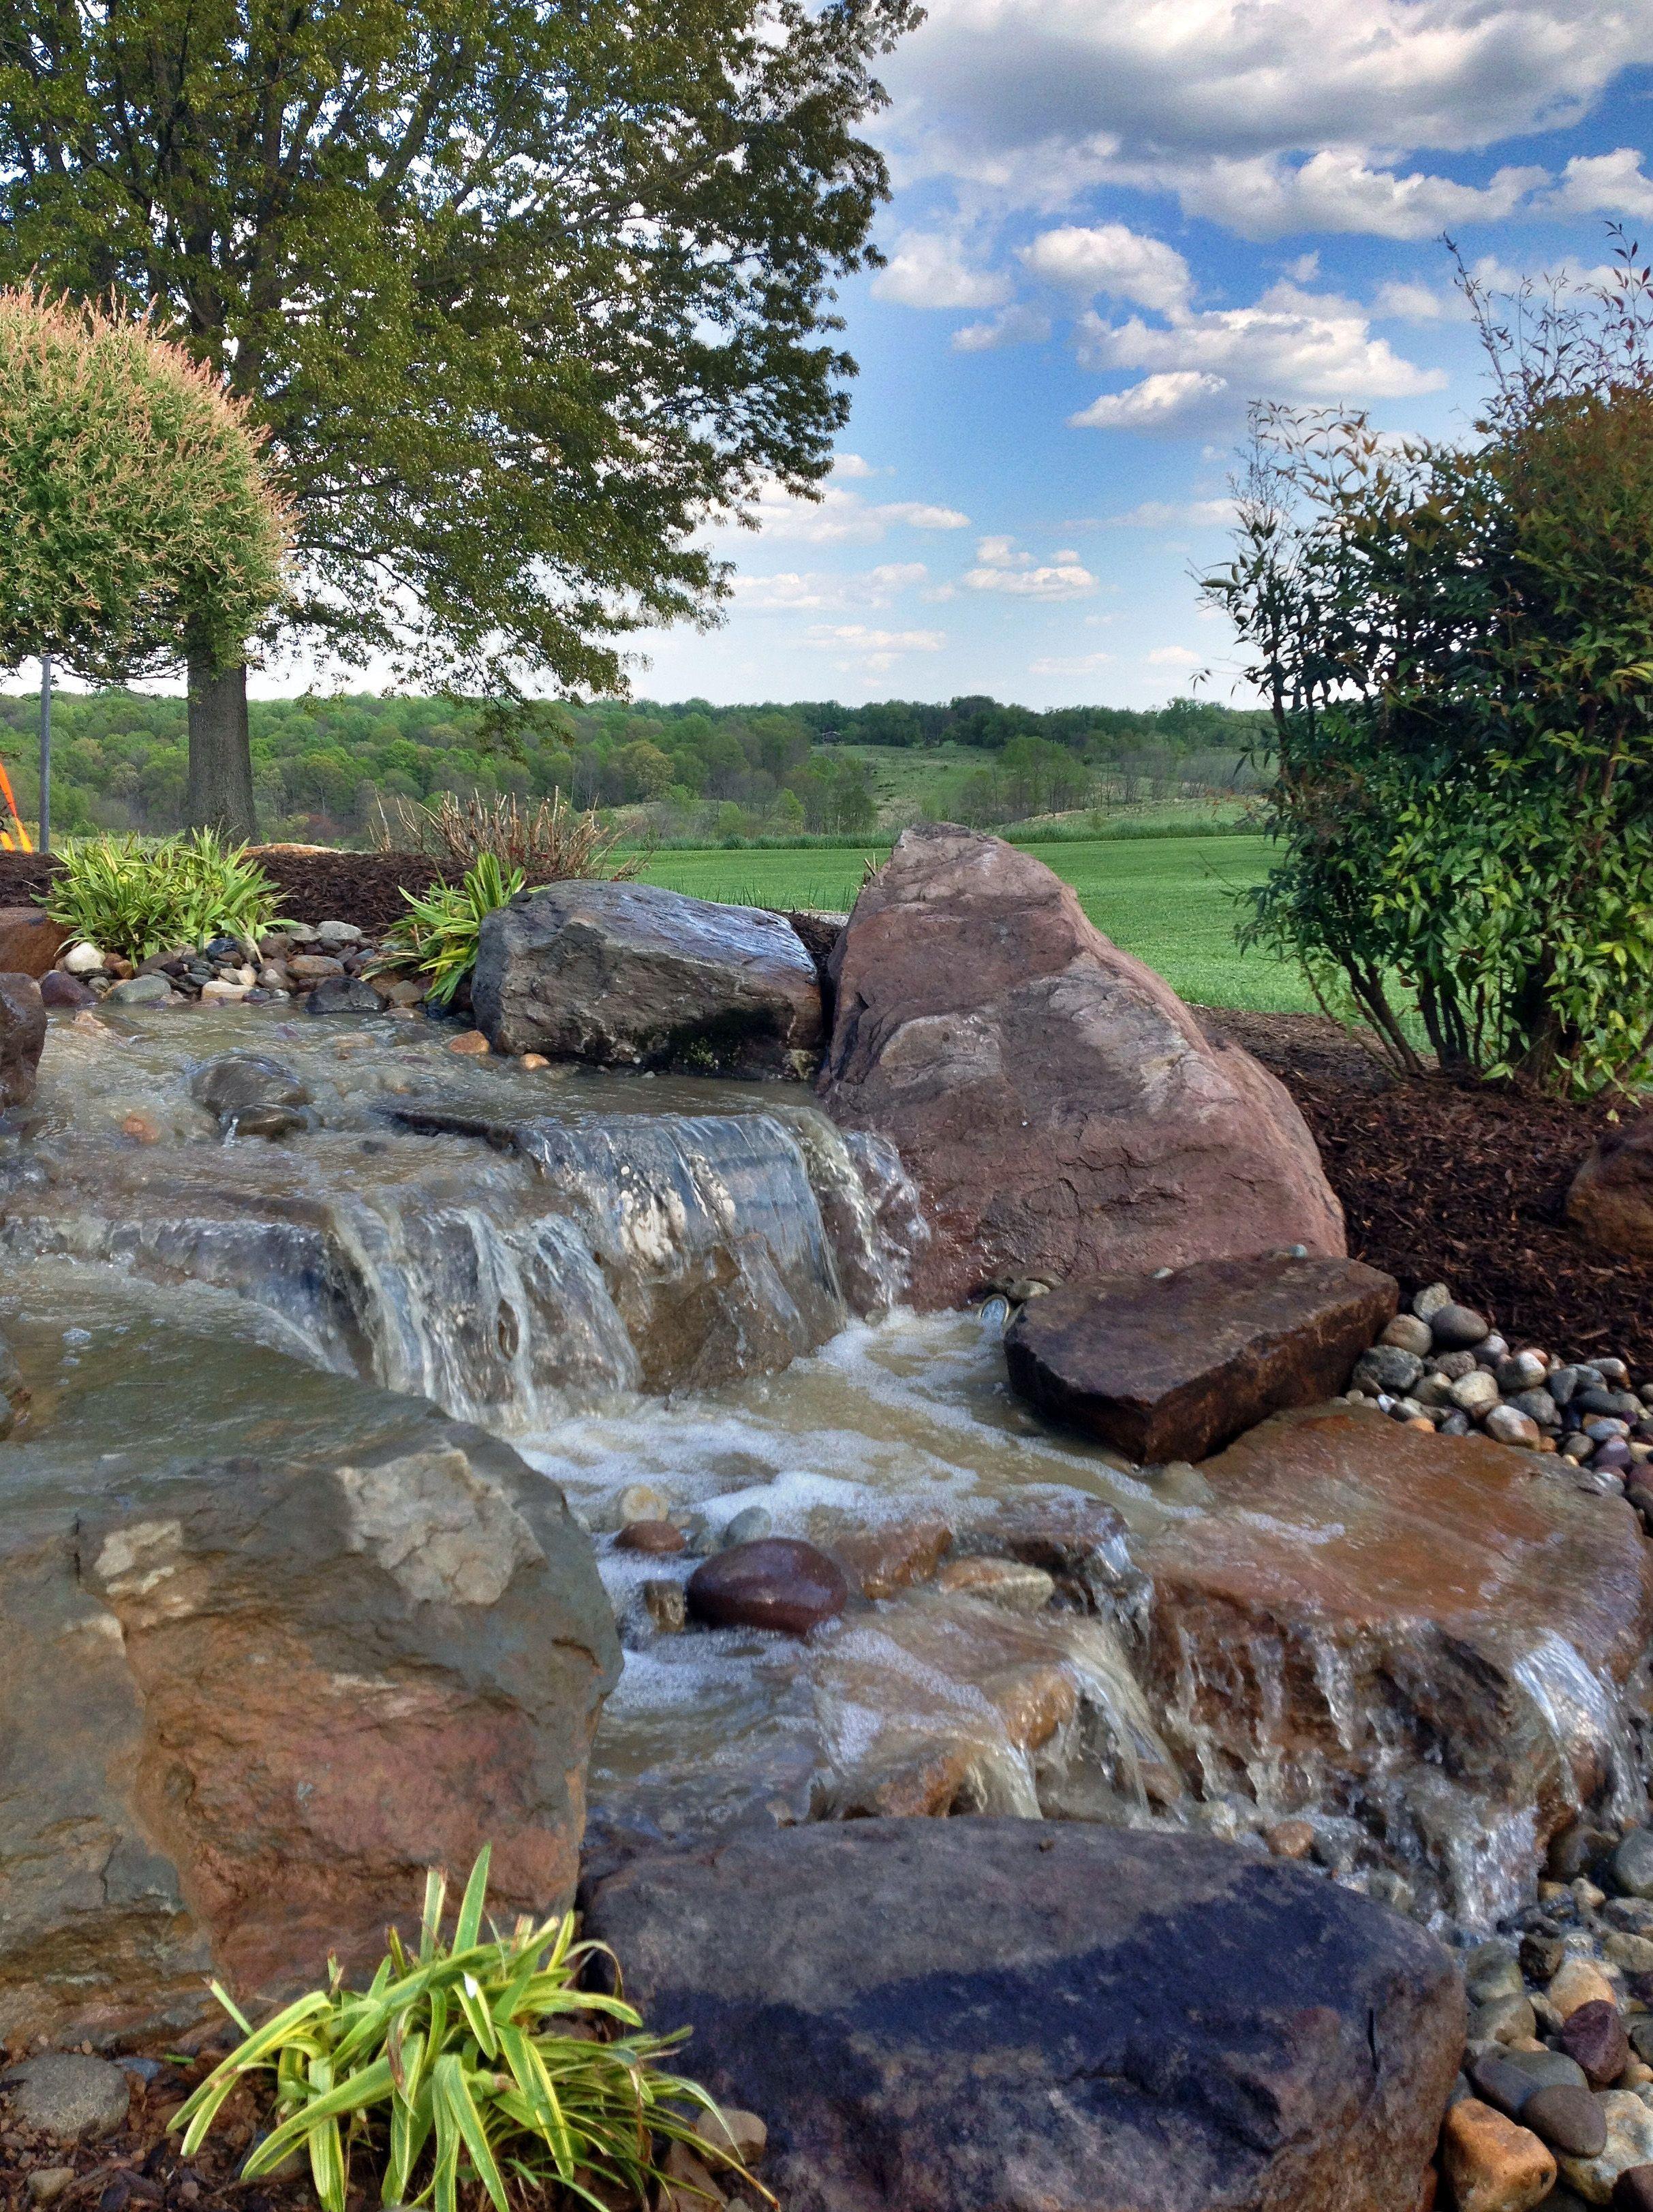 22 Decorative Water Fountains & Fish Ponds ideas   fish ponds, ponds  backyard, water garden